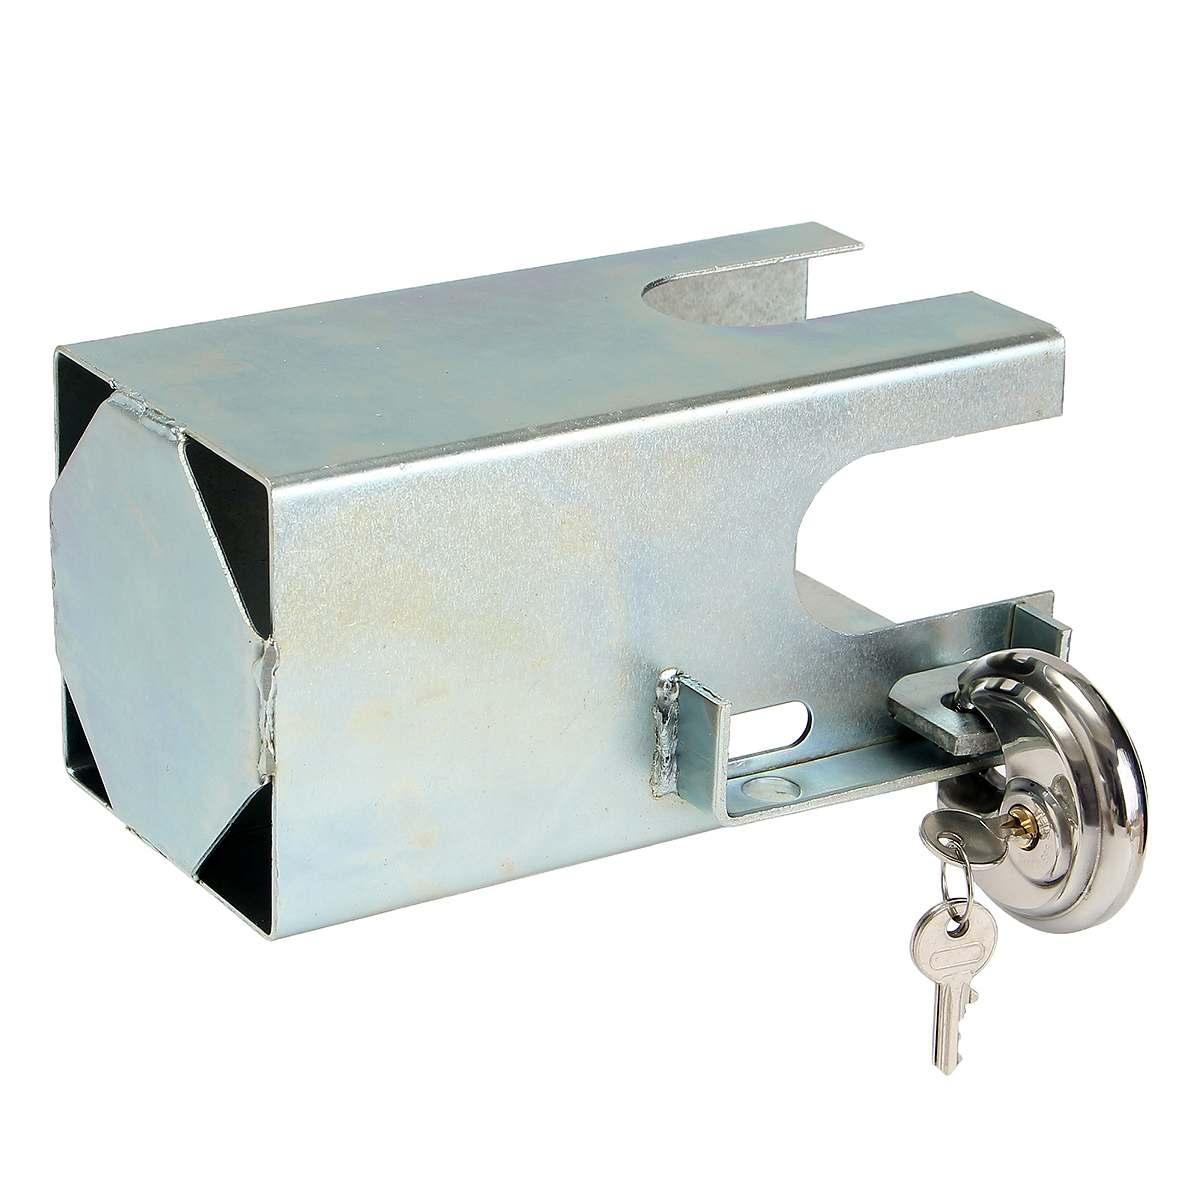 Metal Universal Trailer Security Lock Tow Anti Theft Lock With 2 Keys